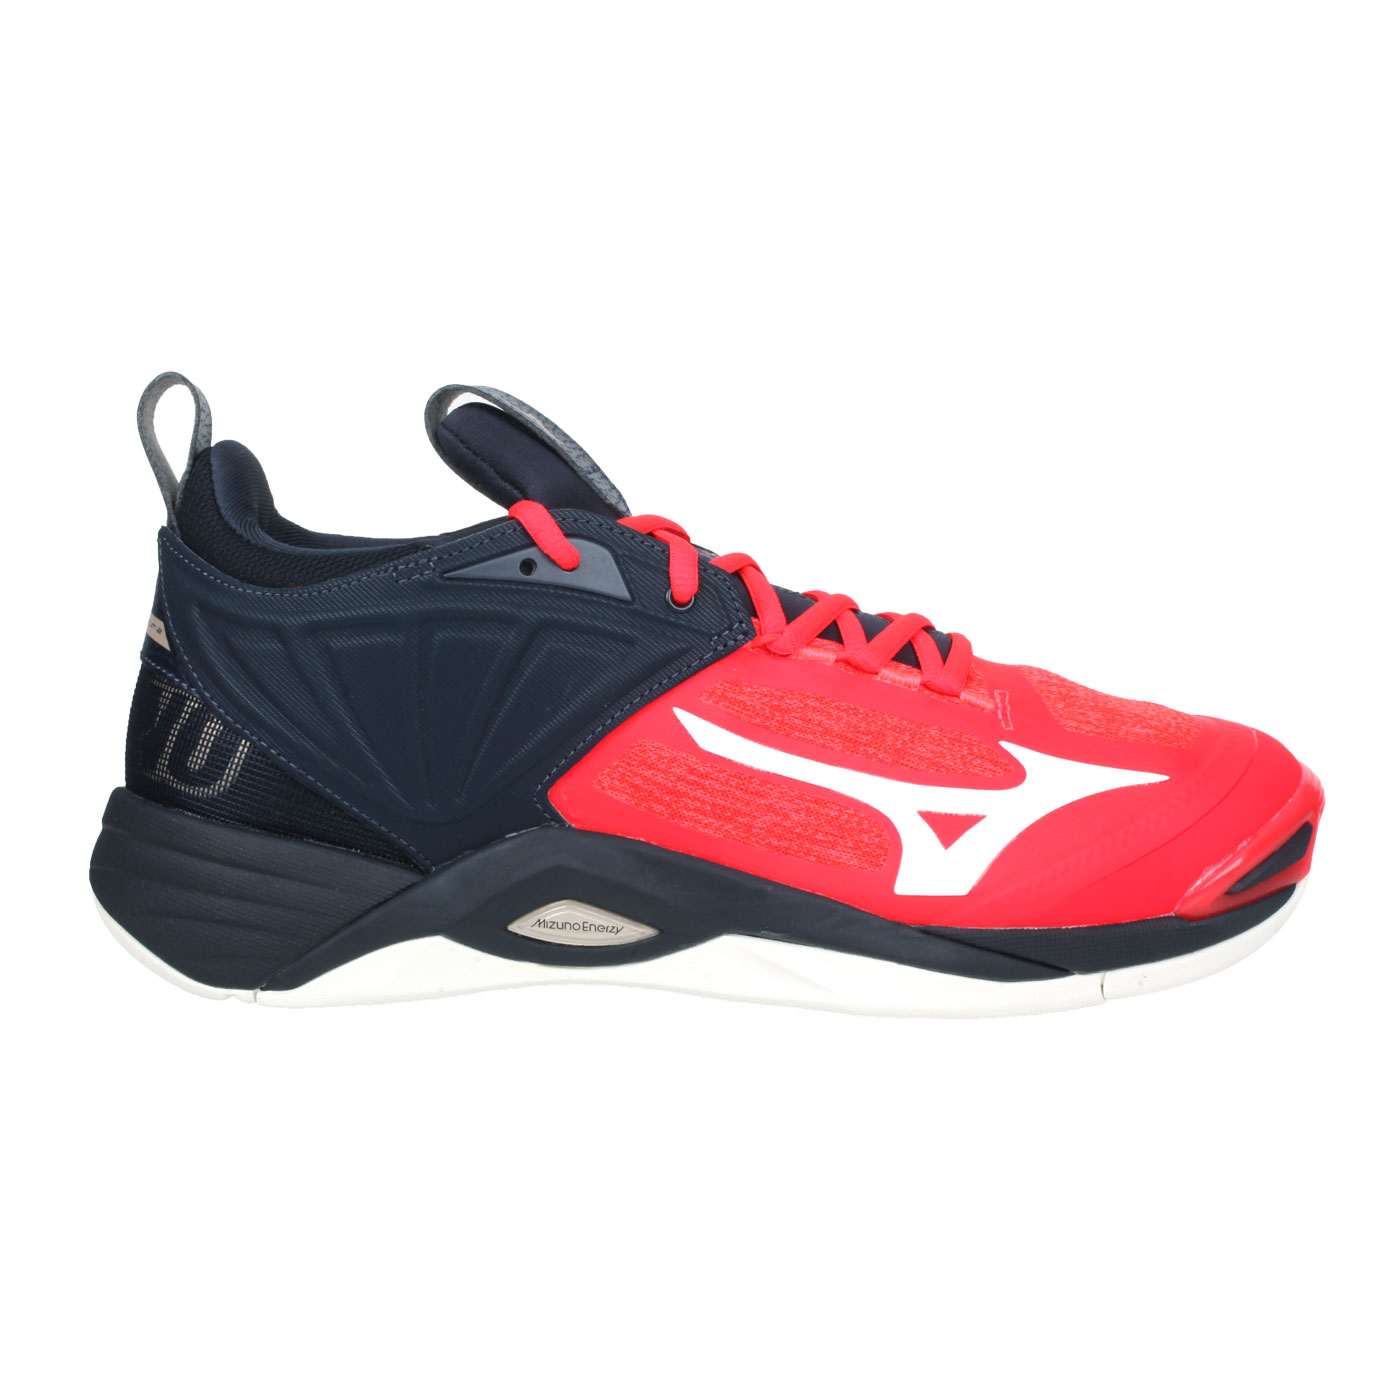 MIZUNO 男款排球鞋  @WAVE MOMENTUM 2@V1GA211263 - 橘紅黑白